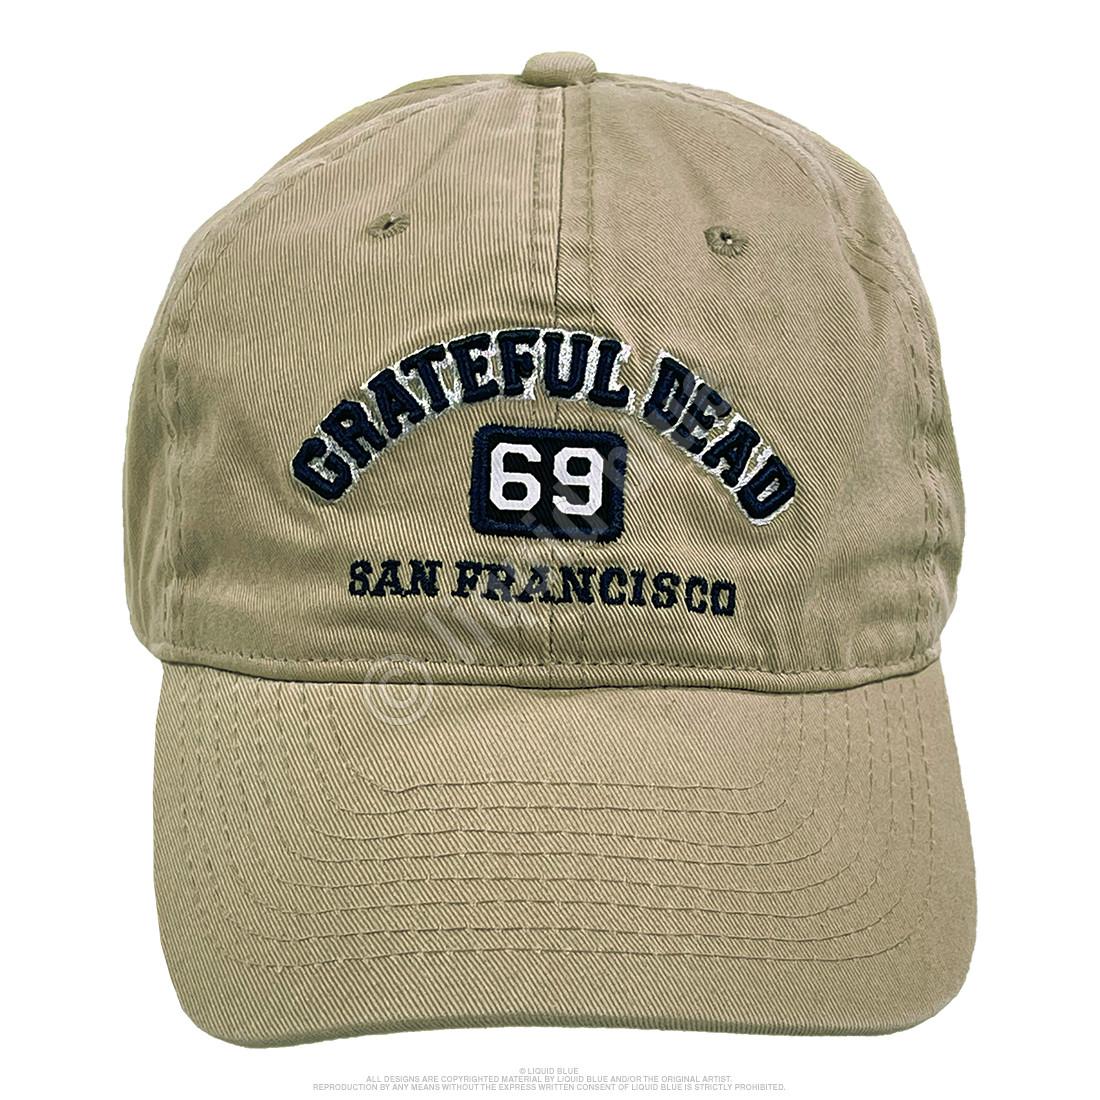 San Francisco 69 Khaki Hat